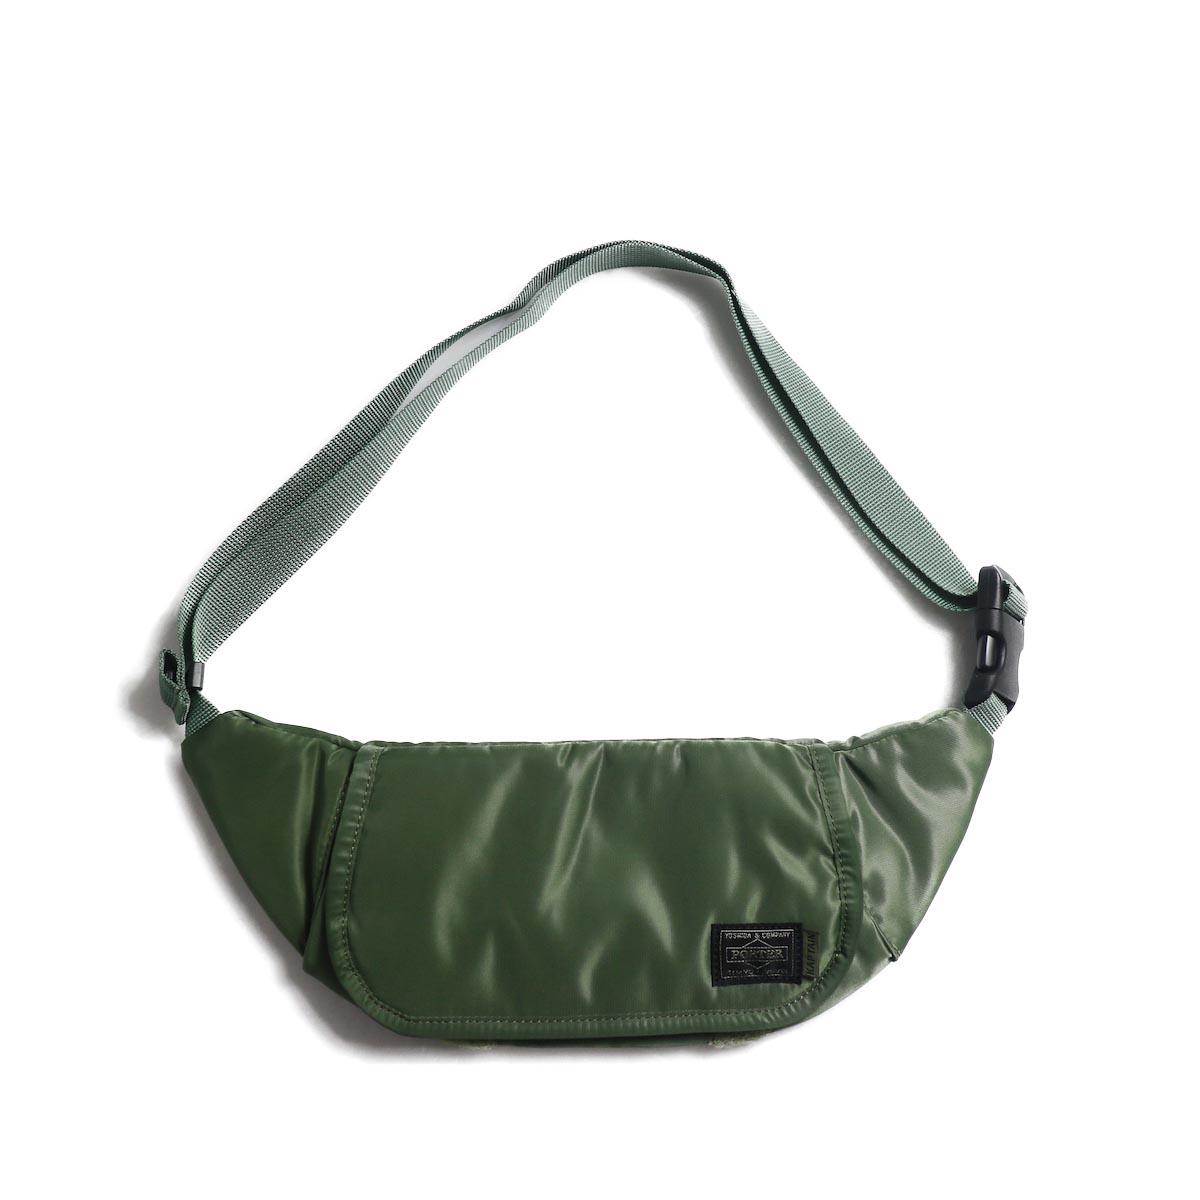 Kaptain Sunshine × Porter / Travellers Funny Bag -Airforce Green